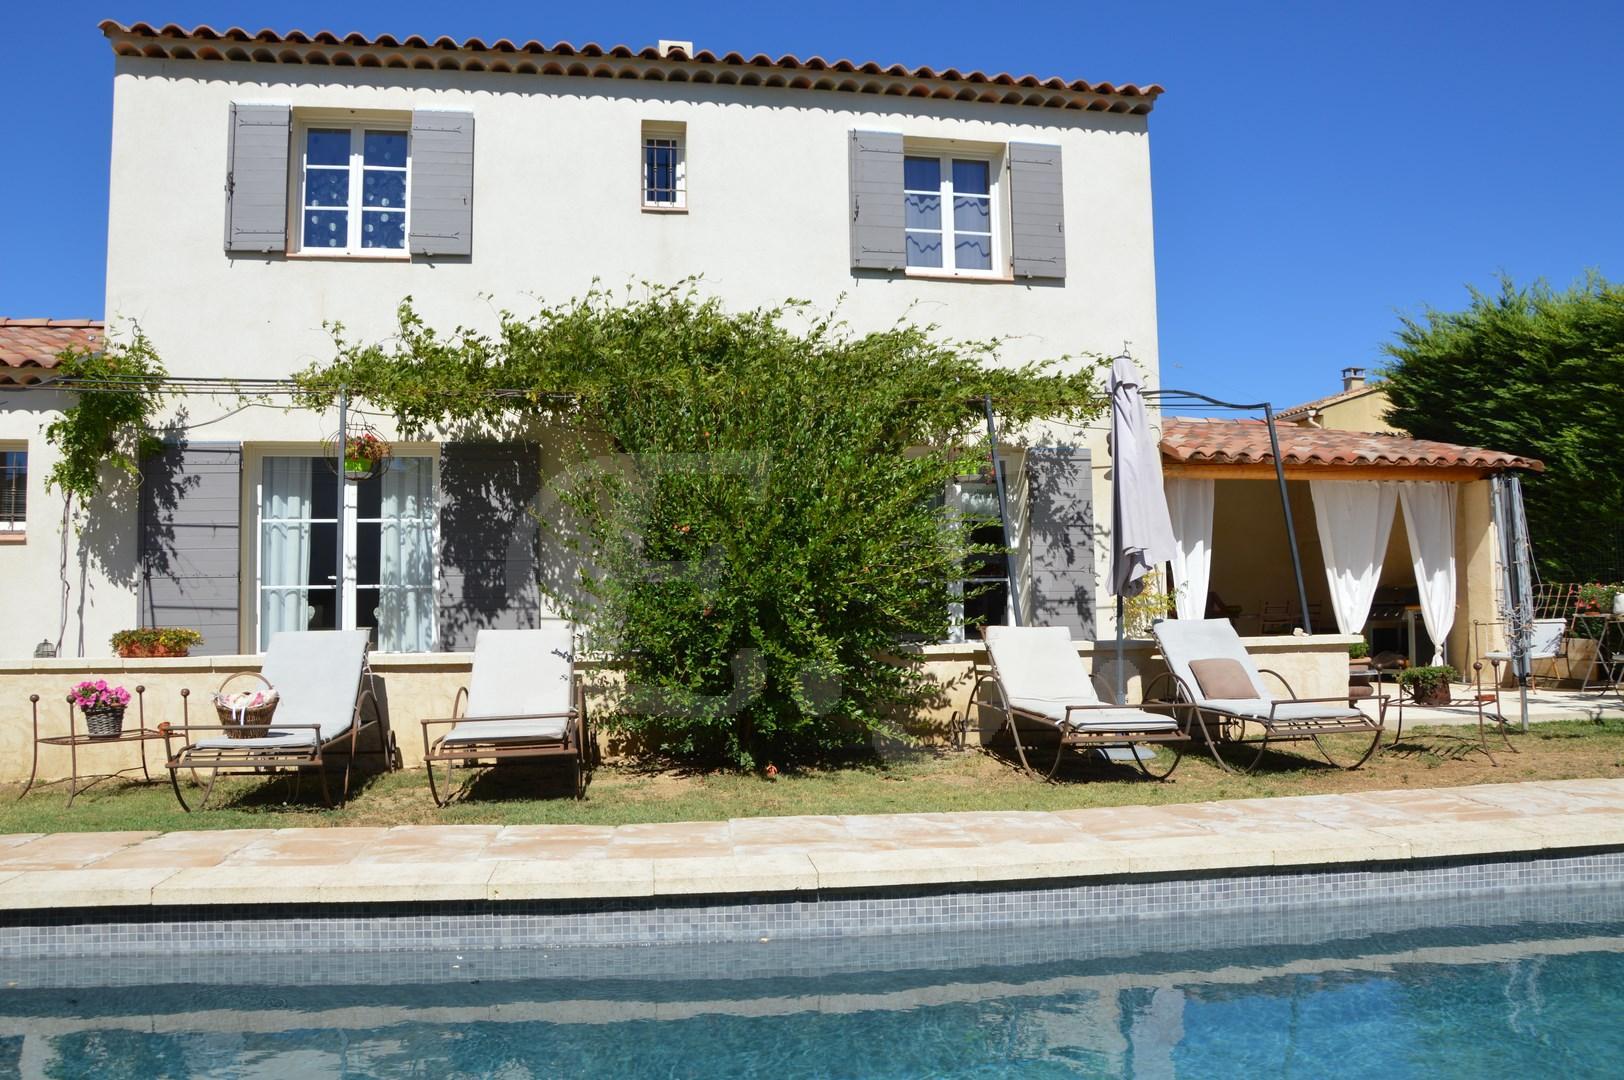 Ventes villa t4 f4 maubec au calme vue luberon jardin avec for Vente tuyau piscine